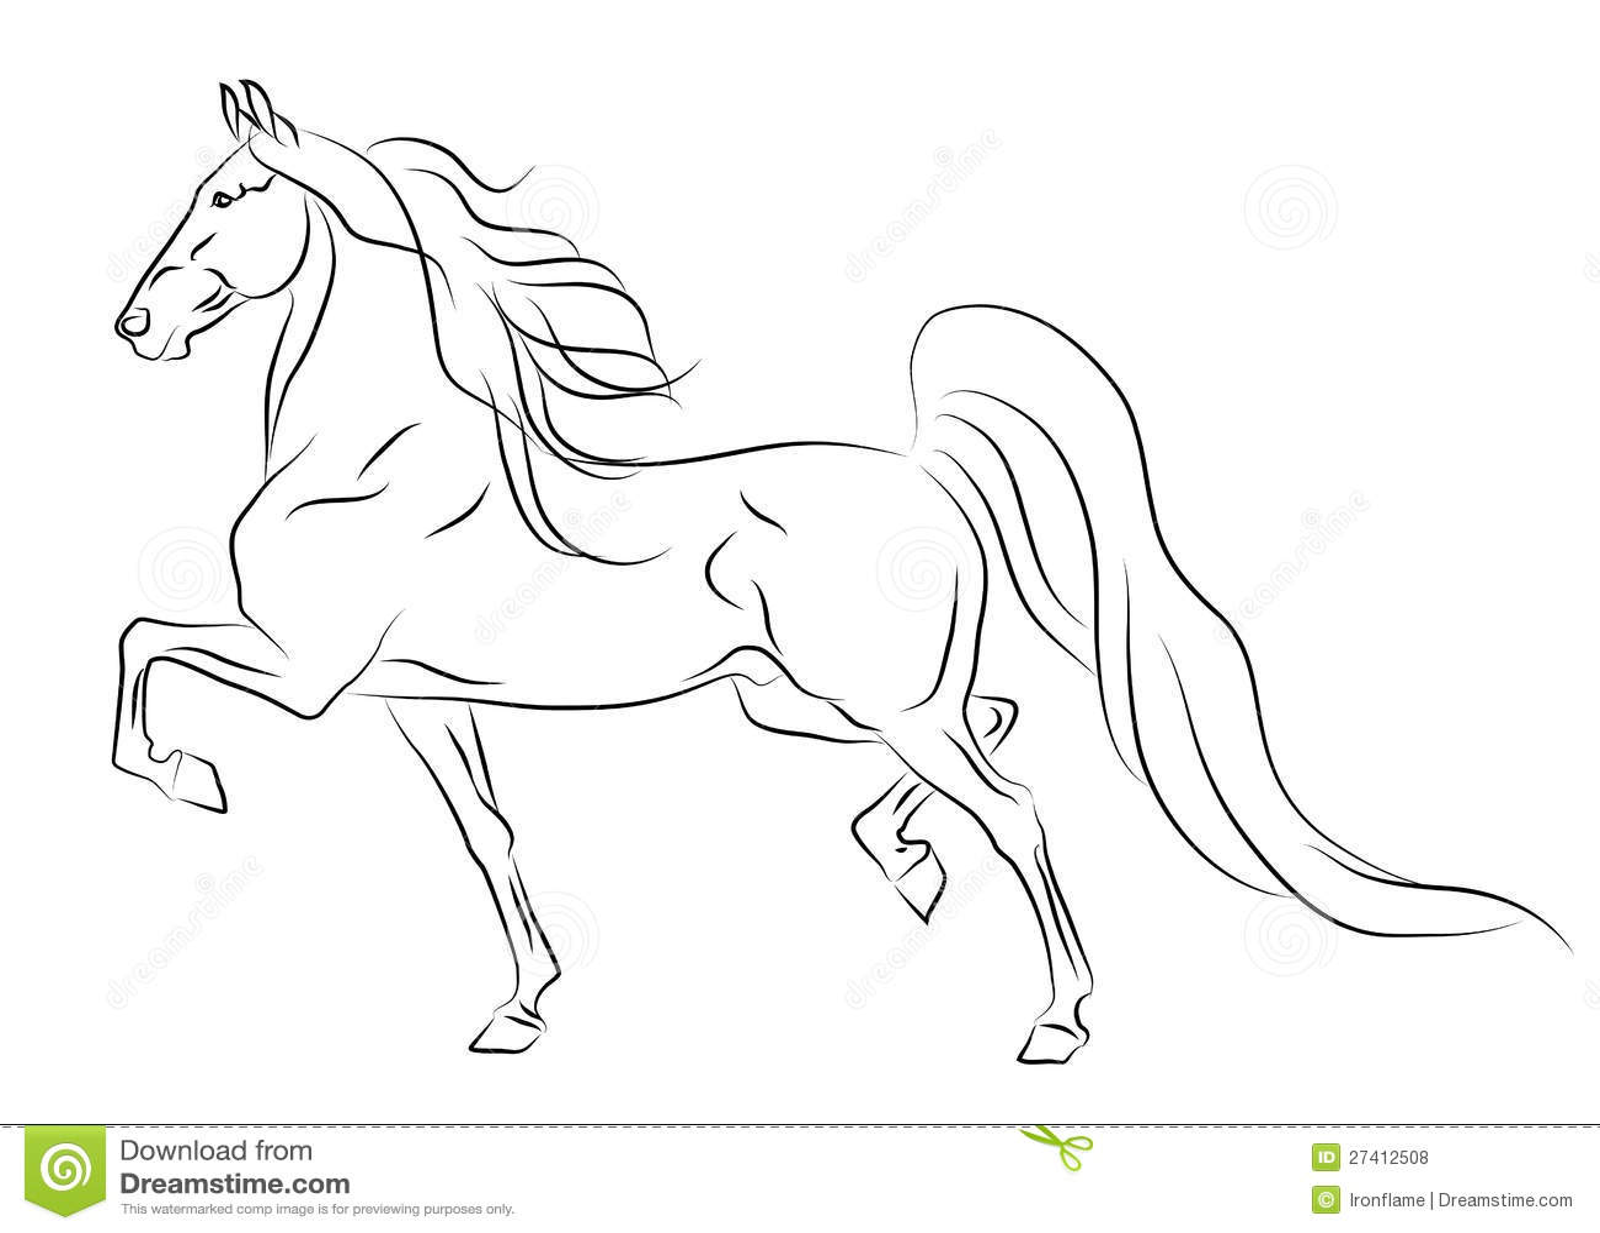 Running American Saddlebred Horse Sketch Royalty Free